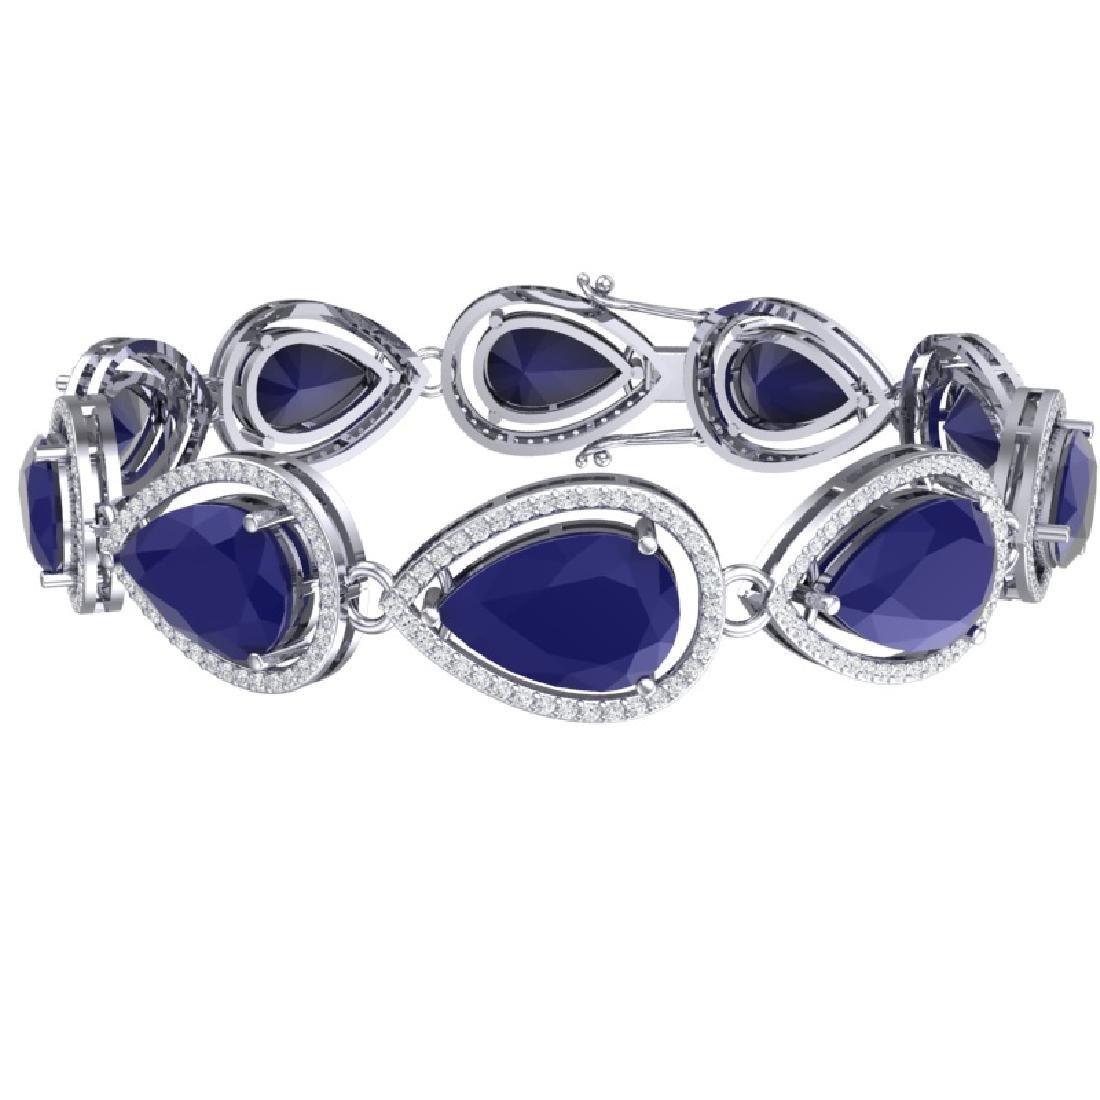 28.31 CTW Royalty Sapphire & VS Diamond Bracelet 18K - 2